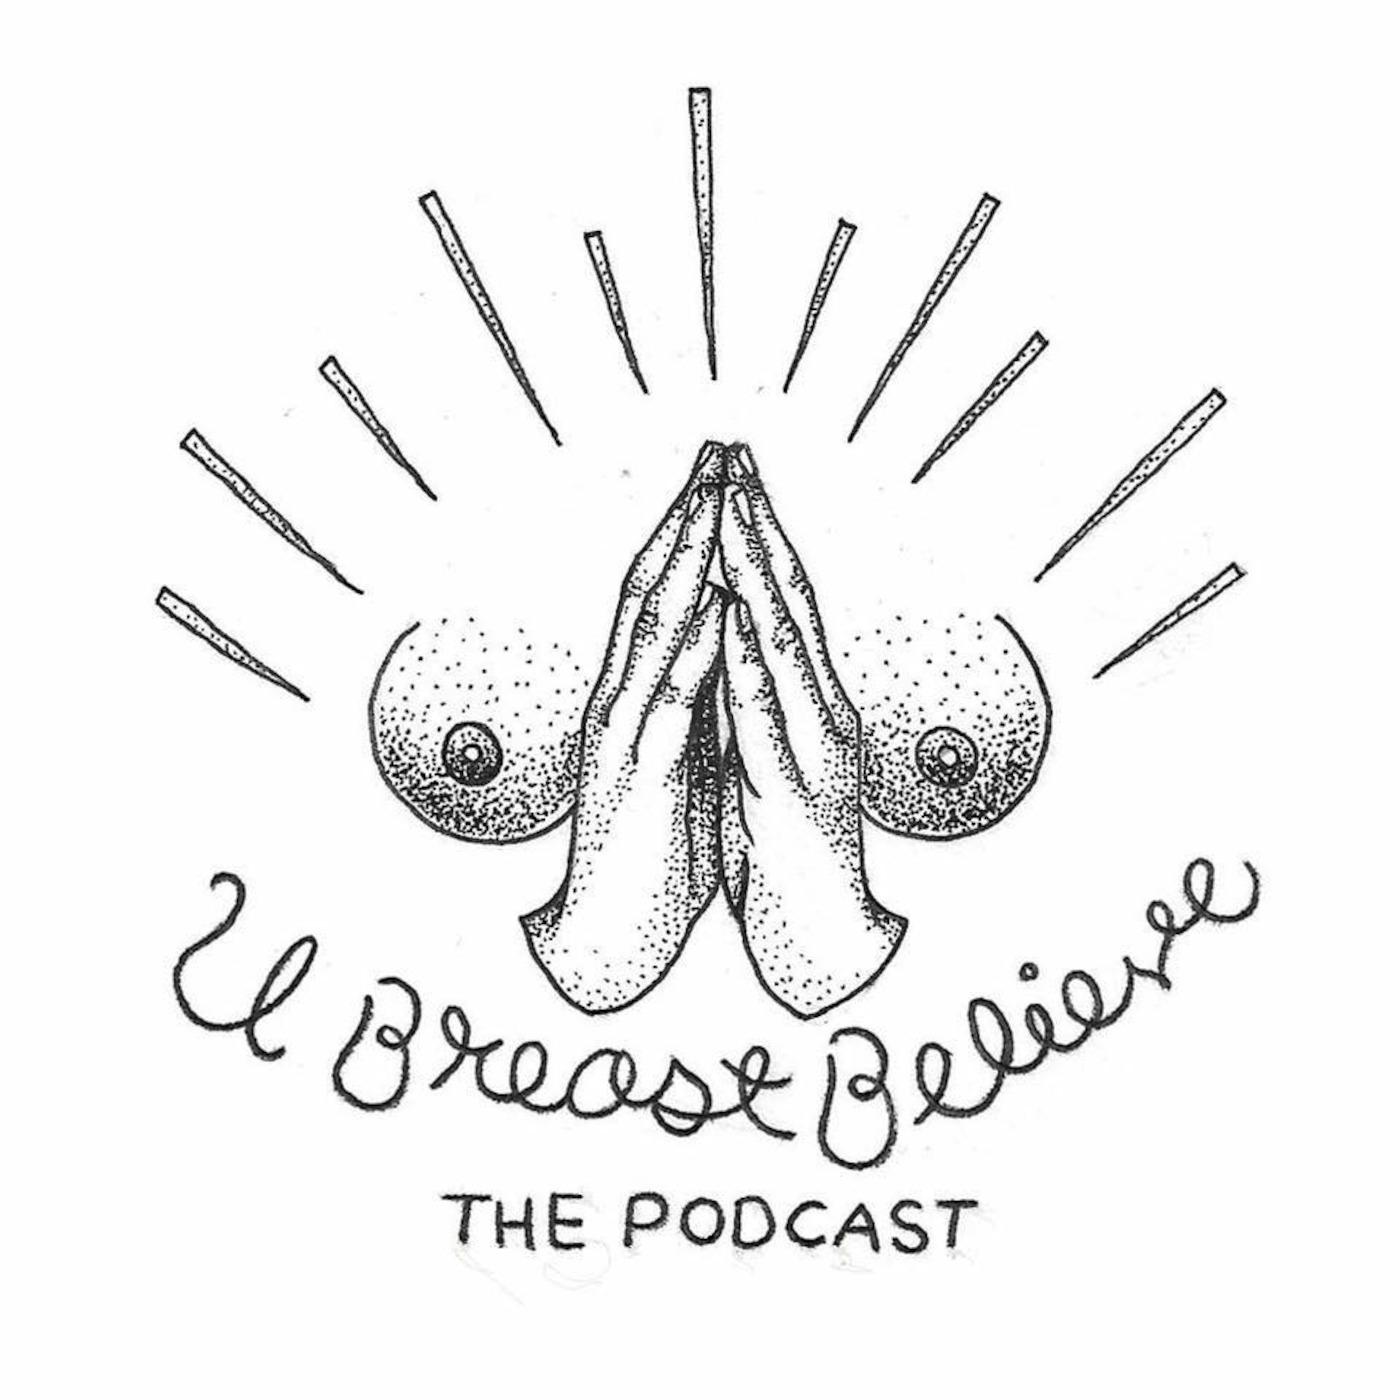 U Breast Believe's Podcast